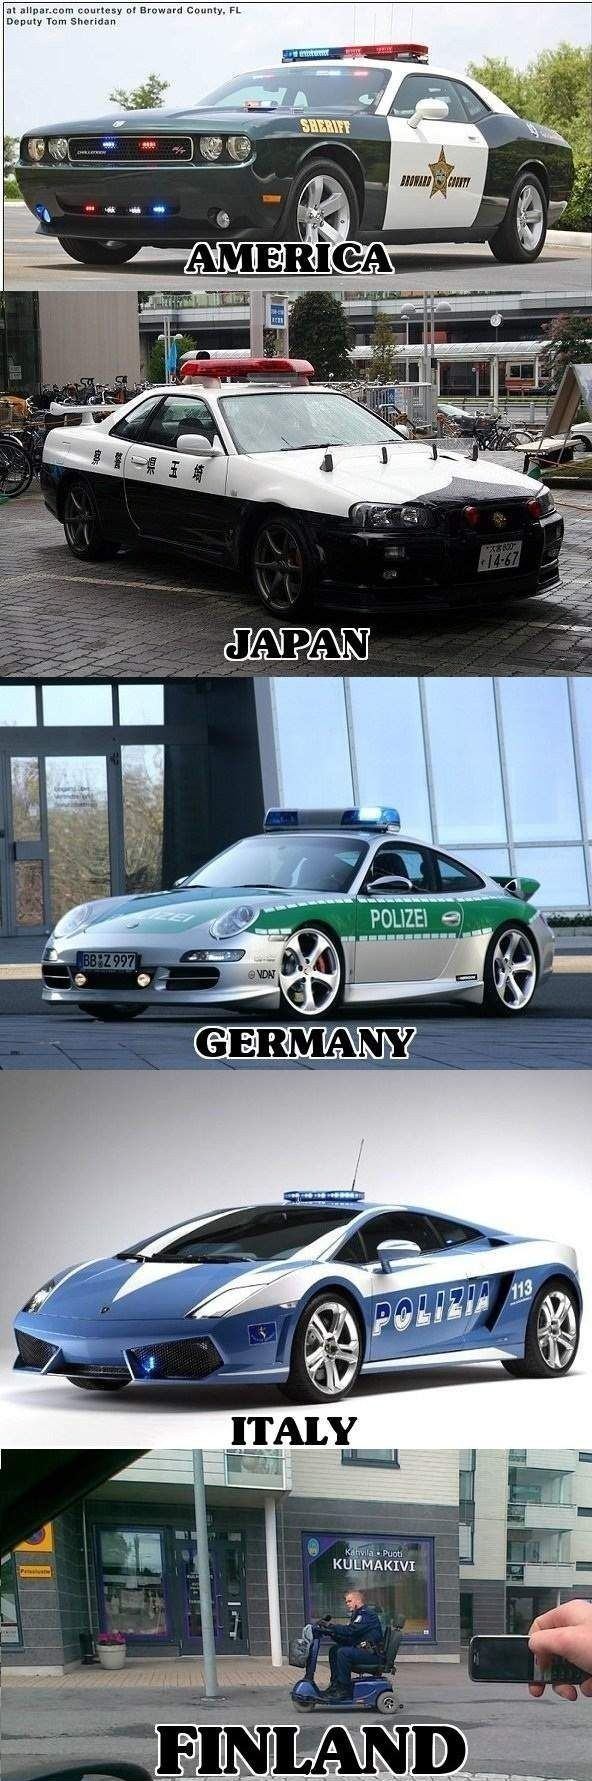 shades sunglasses World Police cars